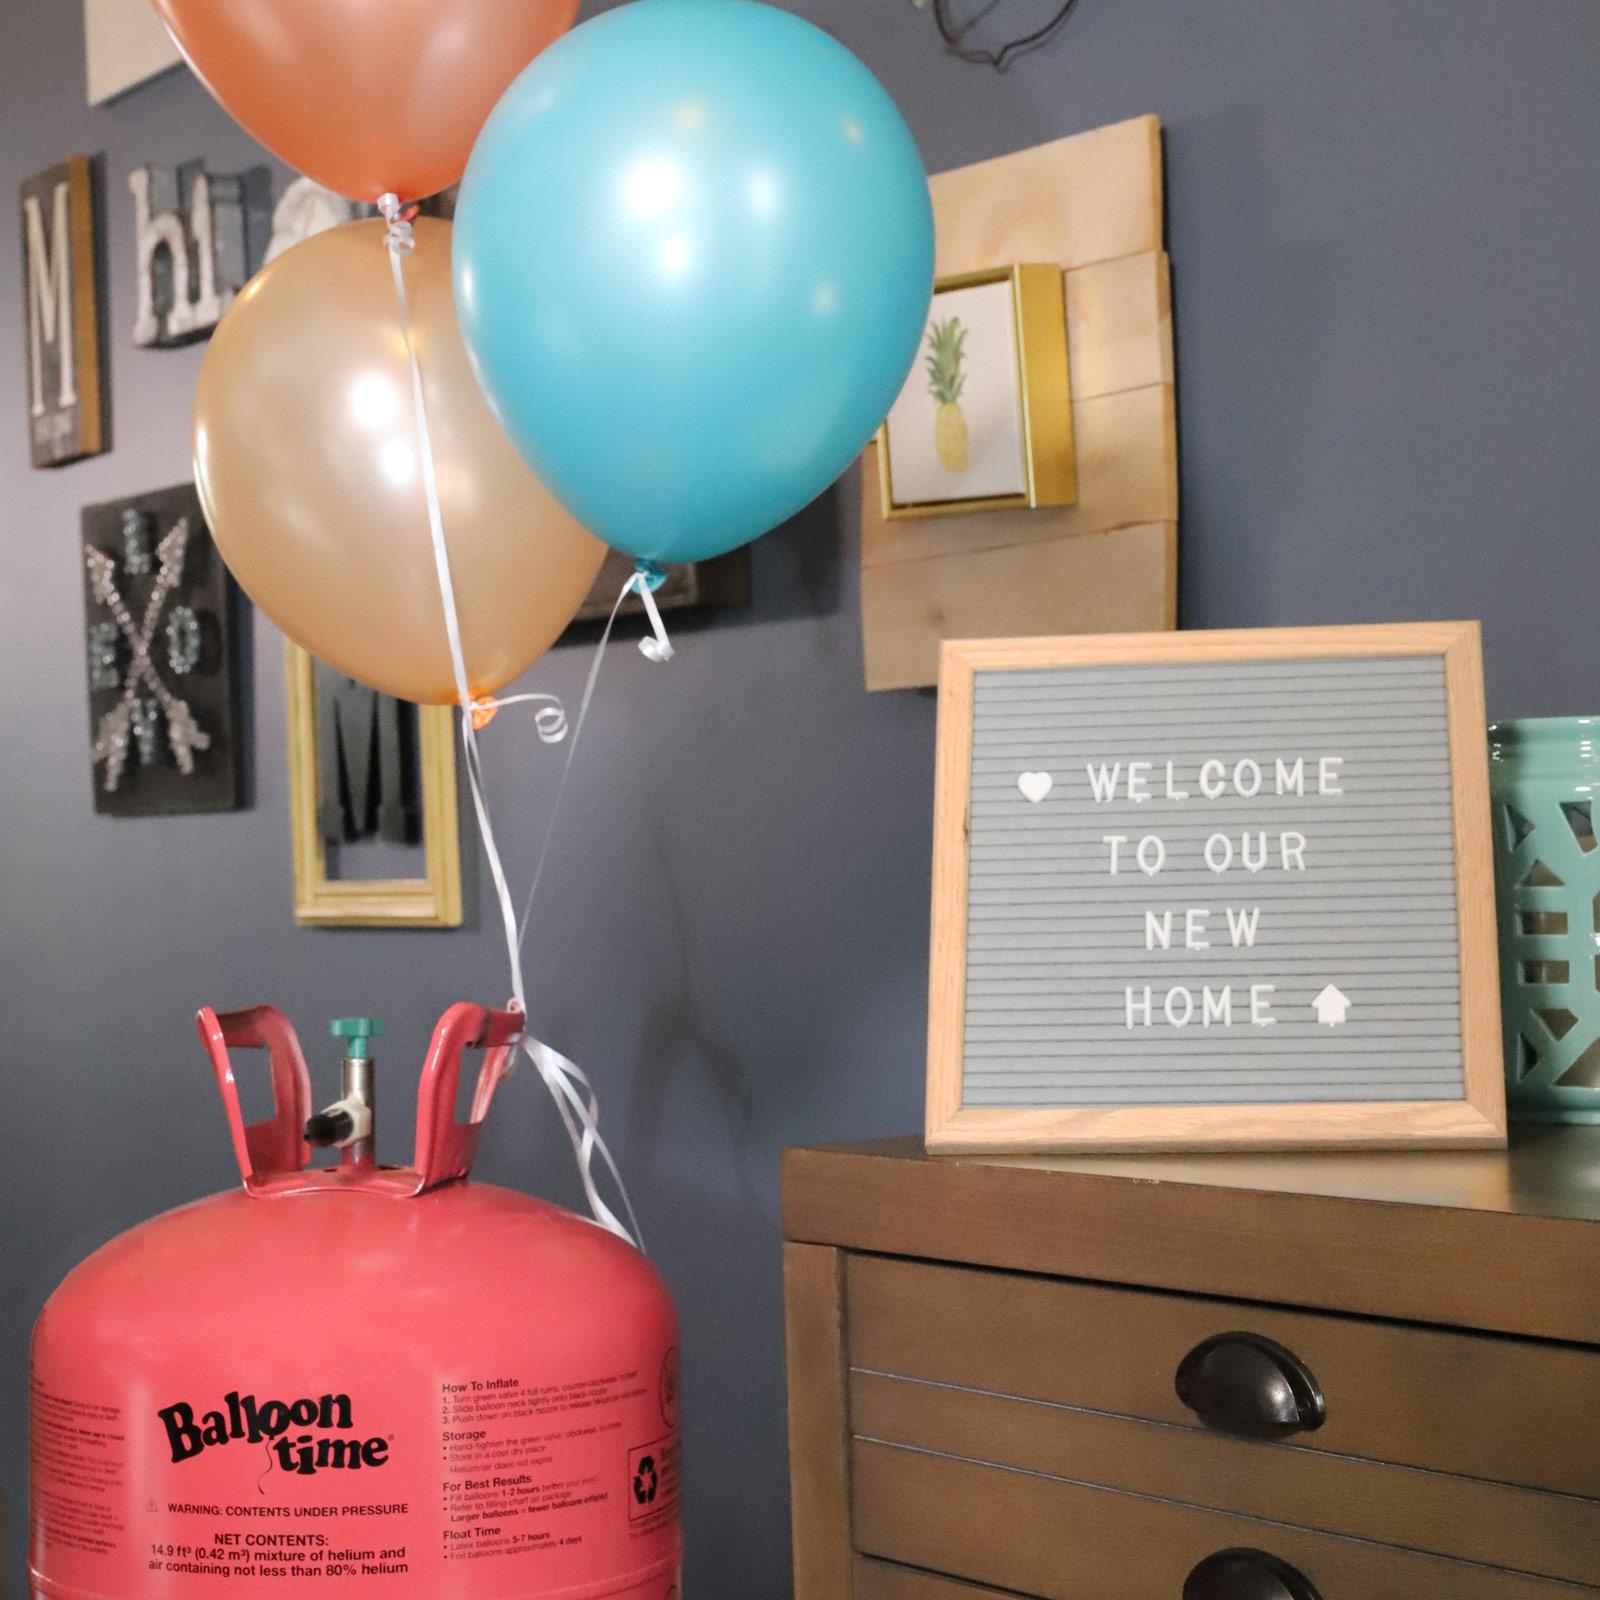 New home celebration decorations